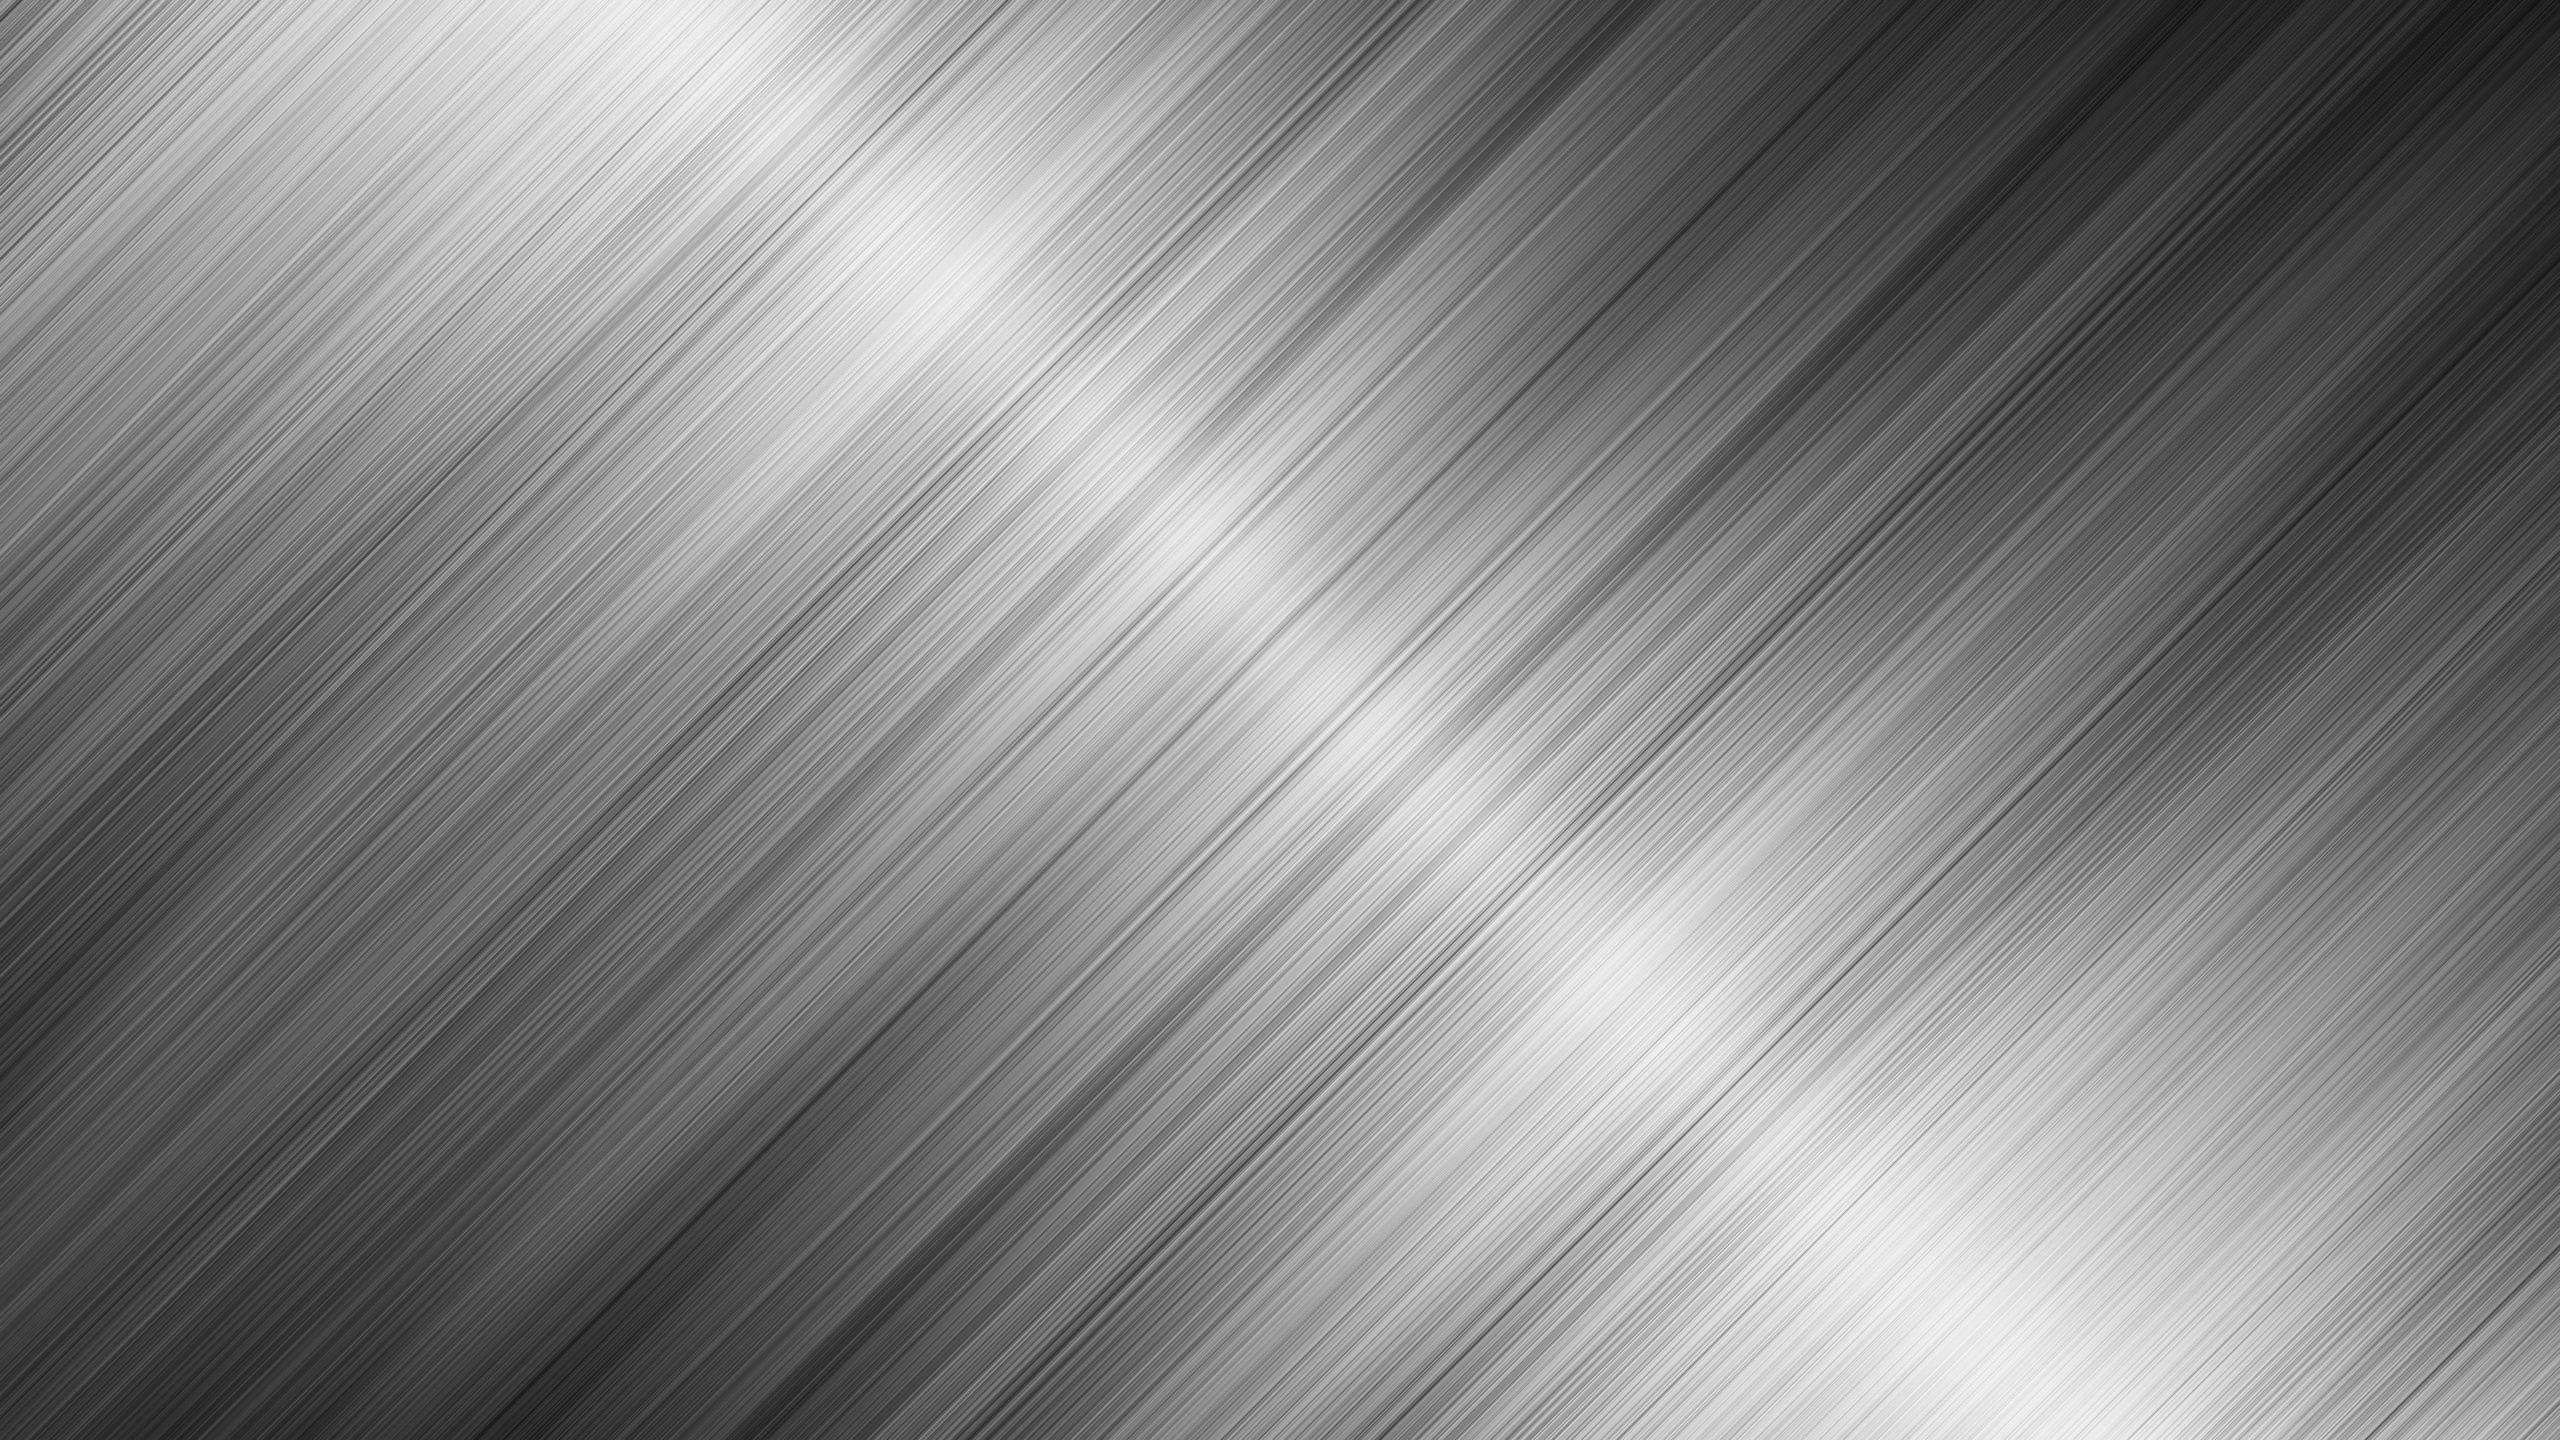 2560x1440.jpg (2560×1440) Fondo de pantalla de plata